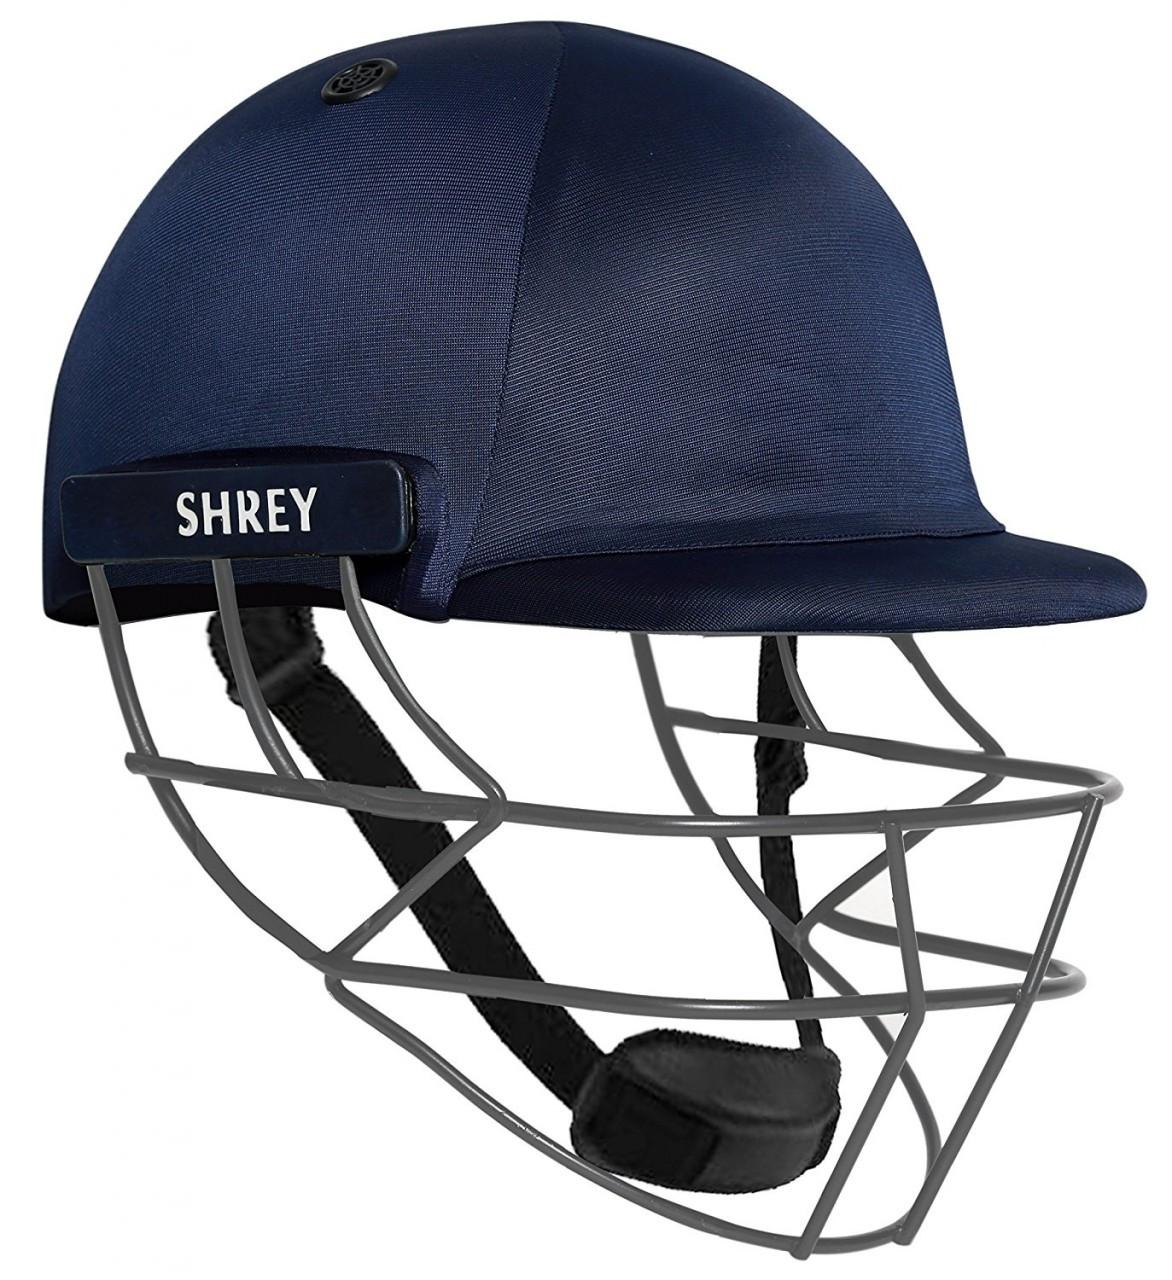 Free Weekday Dispatch Shrey Cricket Helmet Performance 2.0  Steel Grill